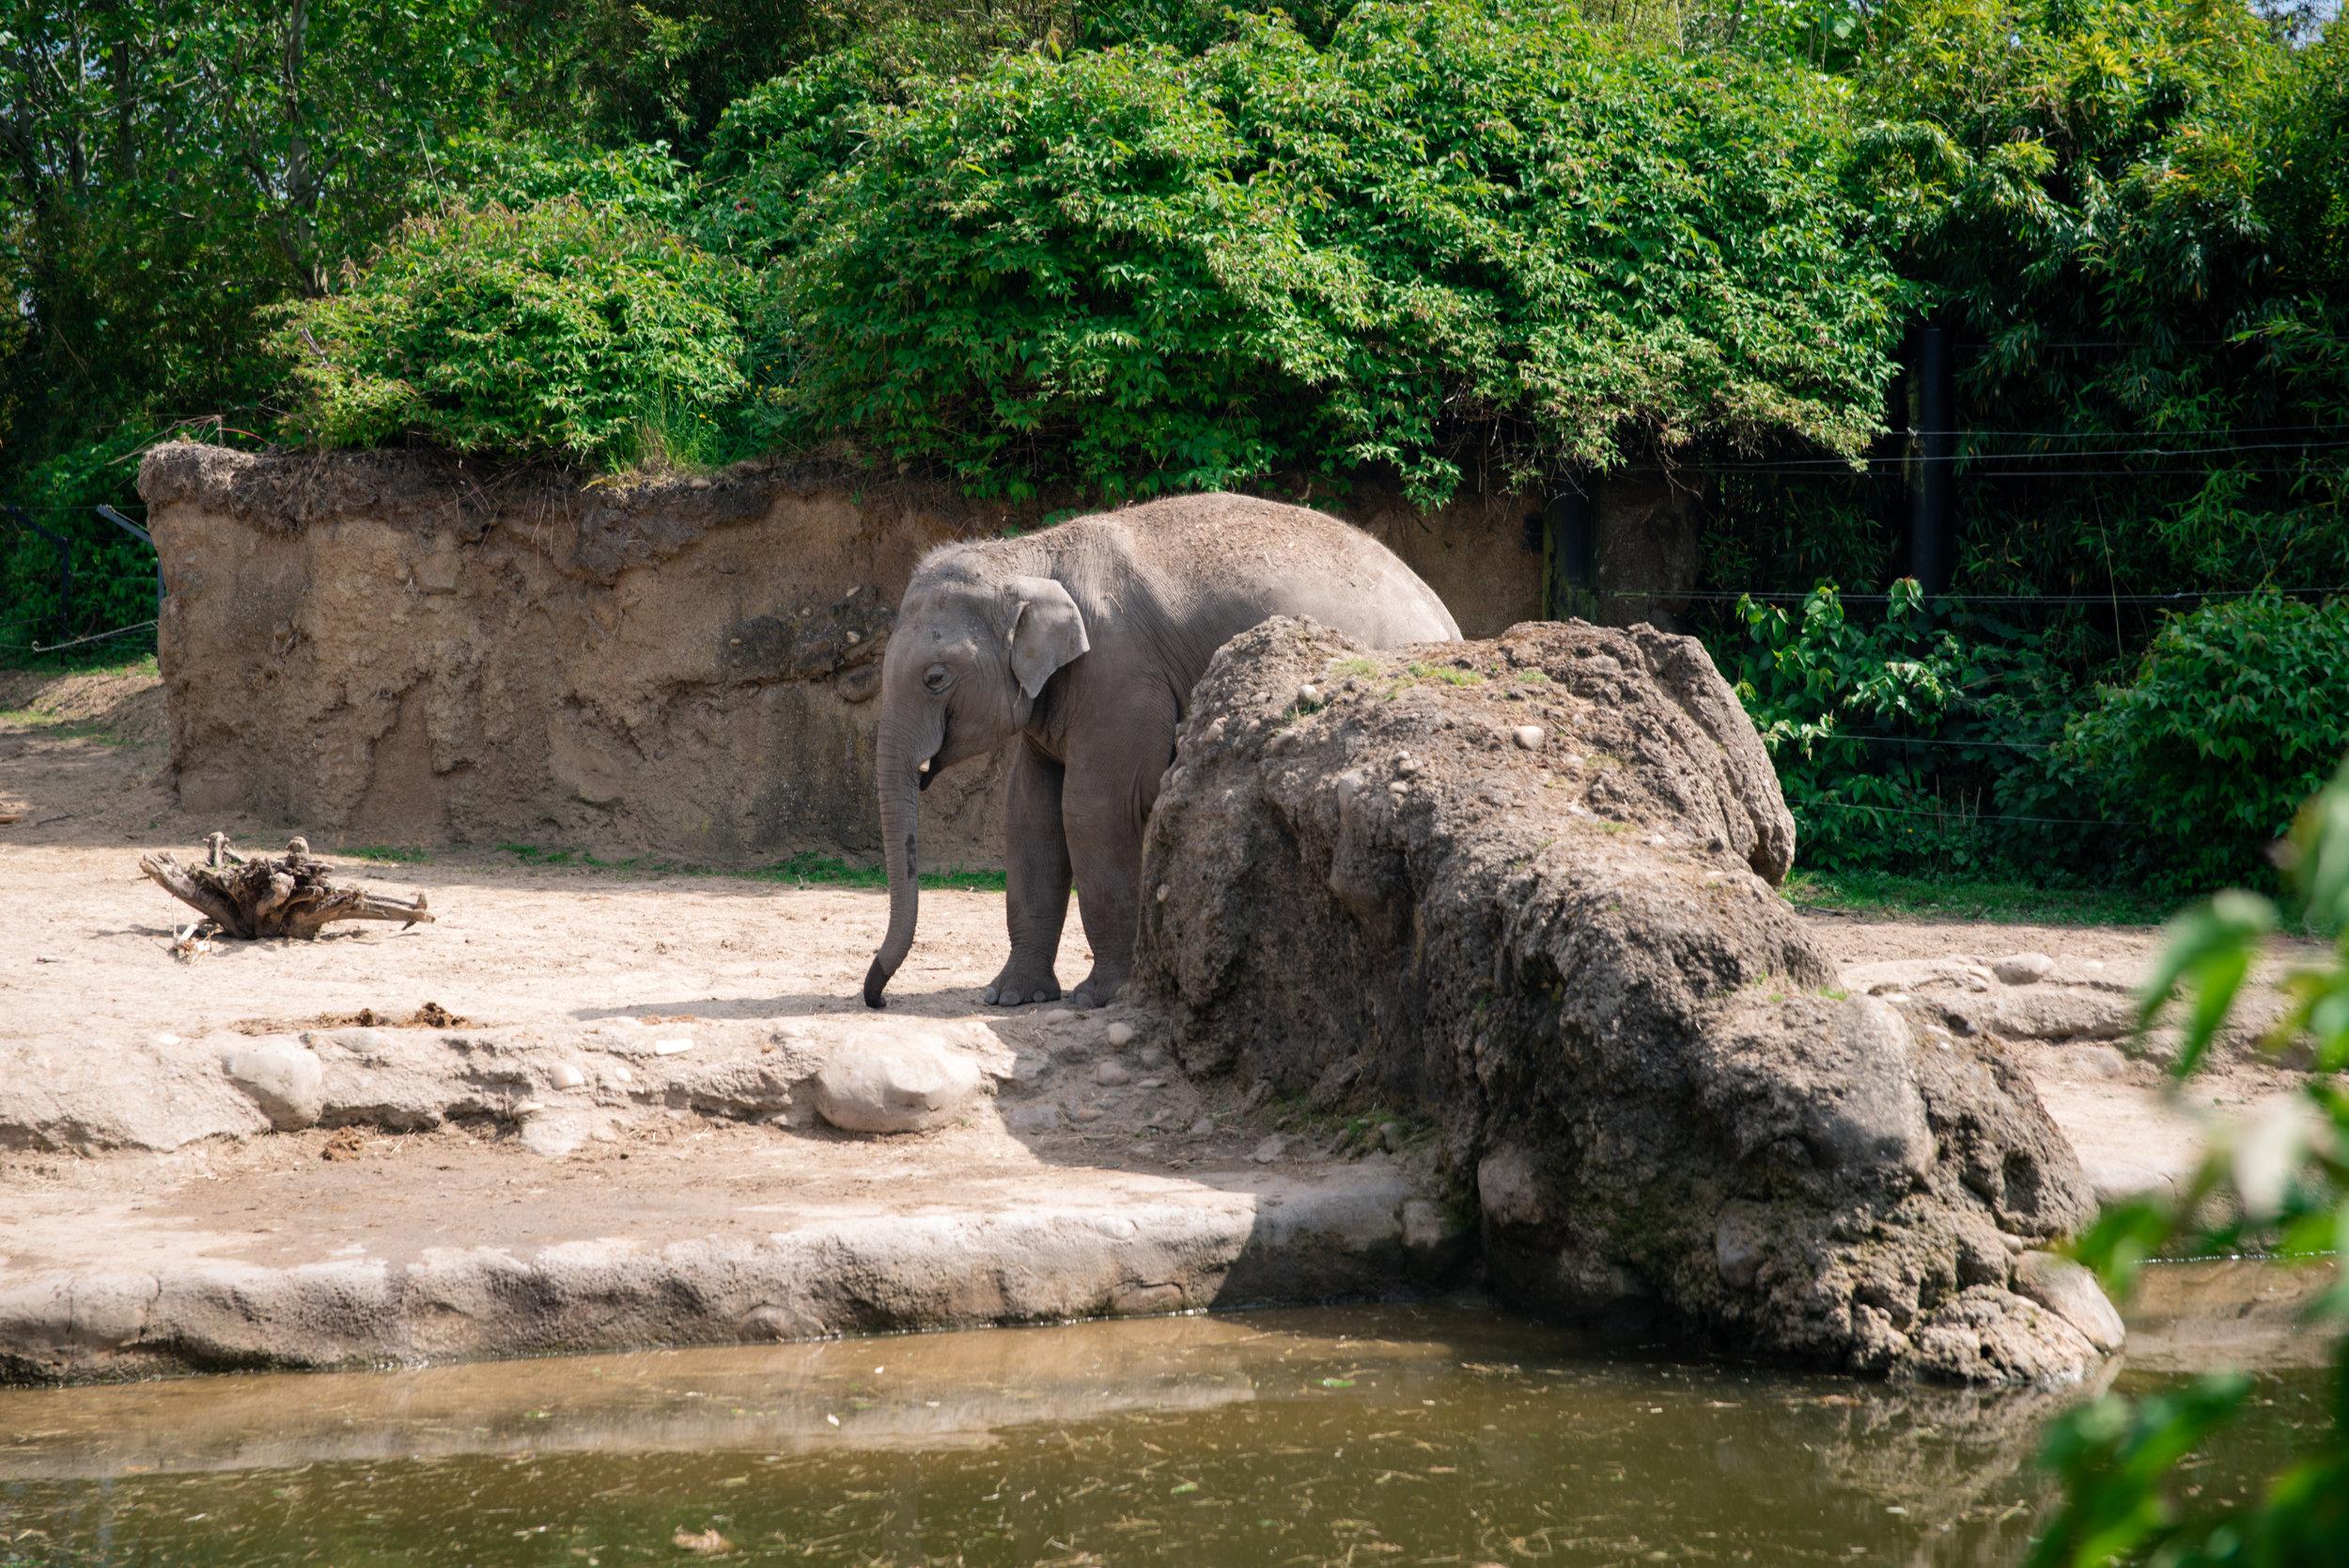 And finally the Elephants!